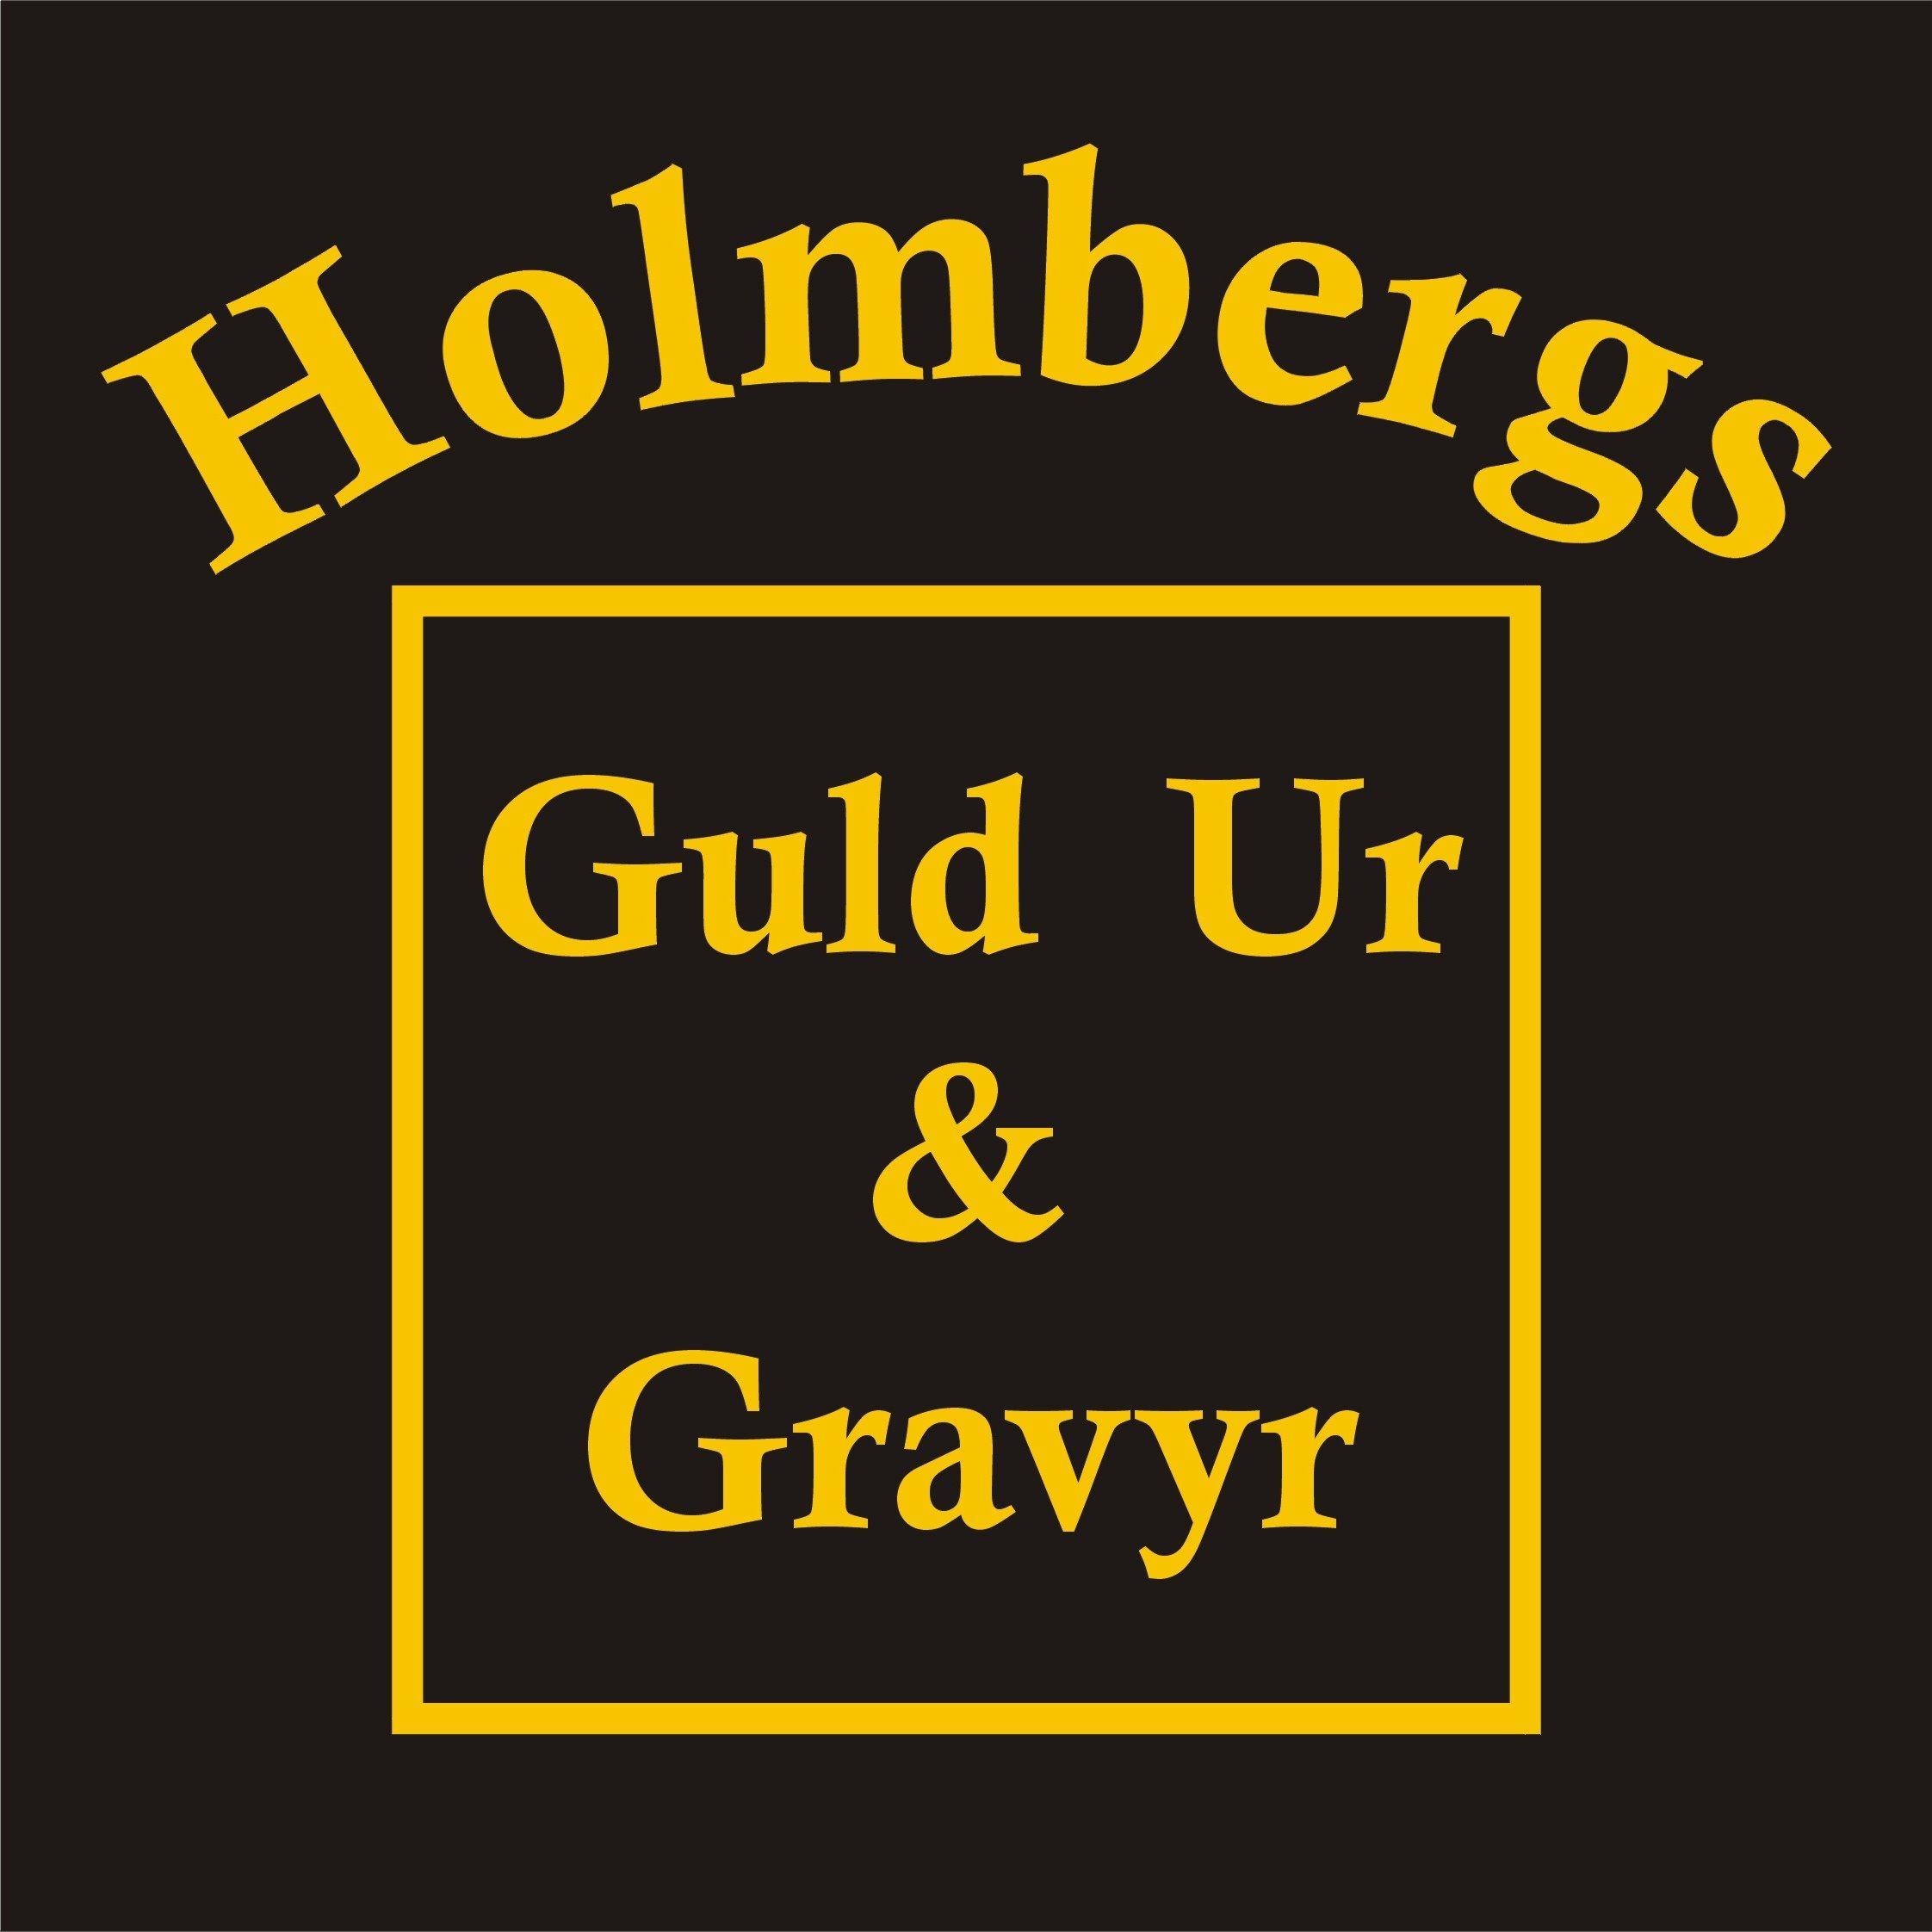 Holmbergs Guld, Ur & Gravyr AB